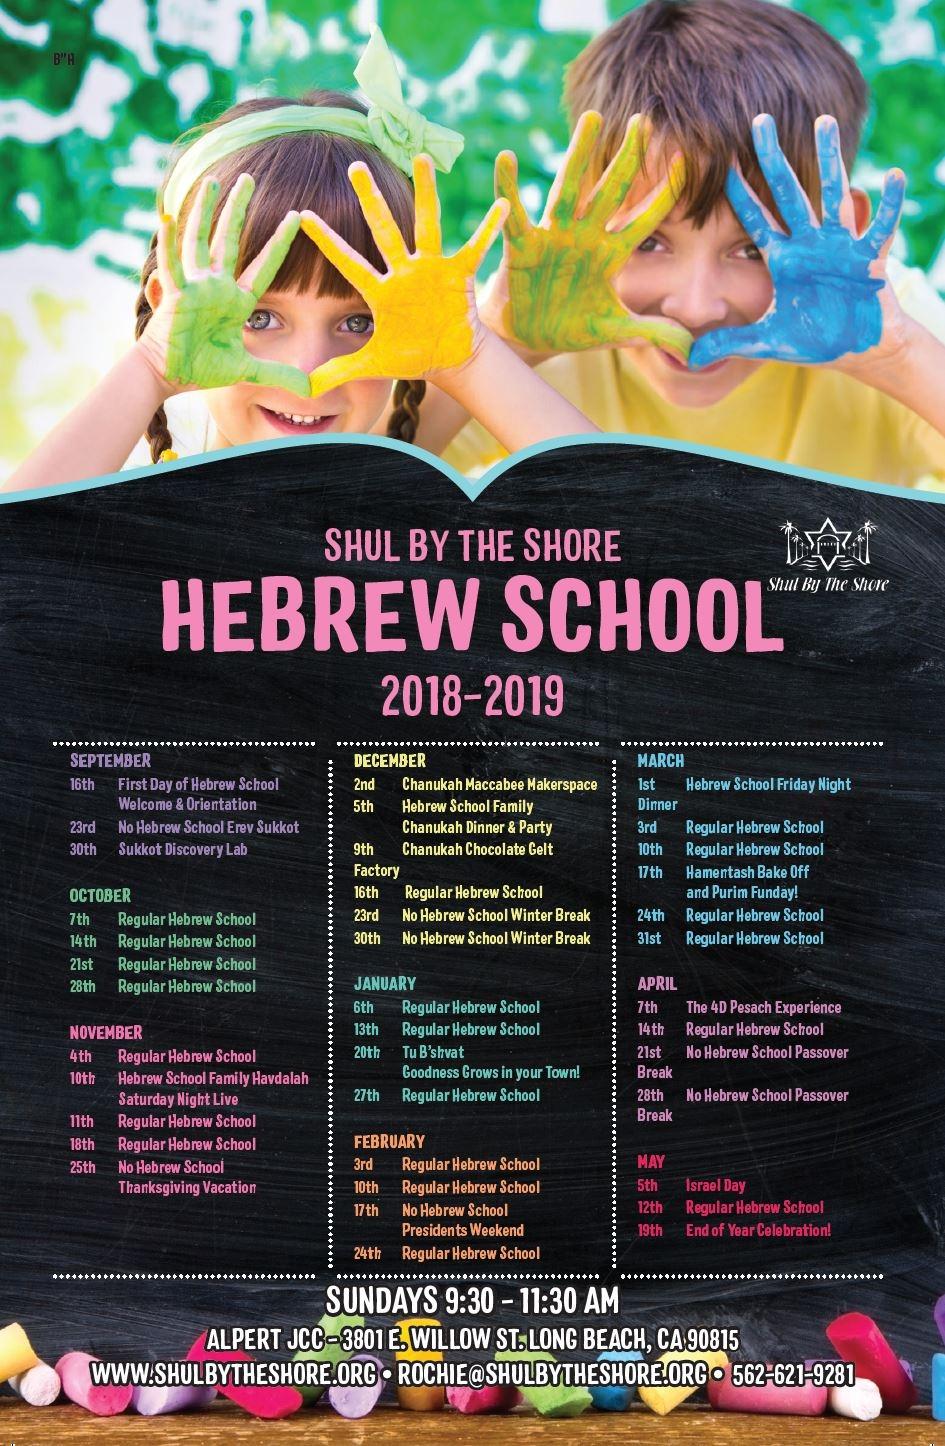 HebrewSchoolSchedule2018-2019.JPG